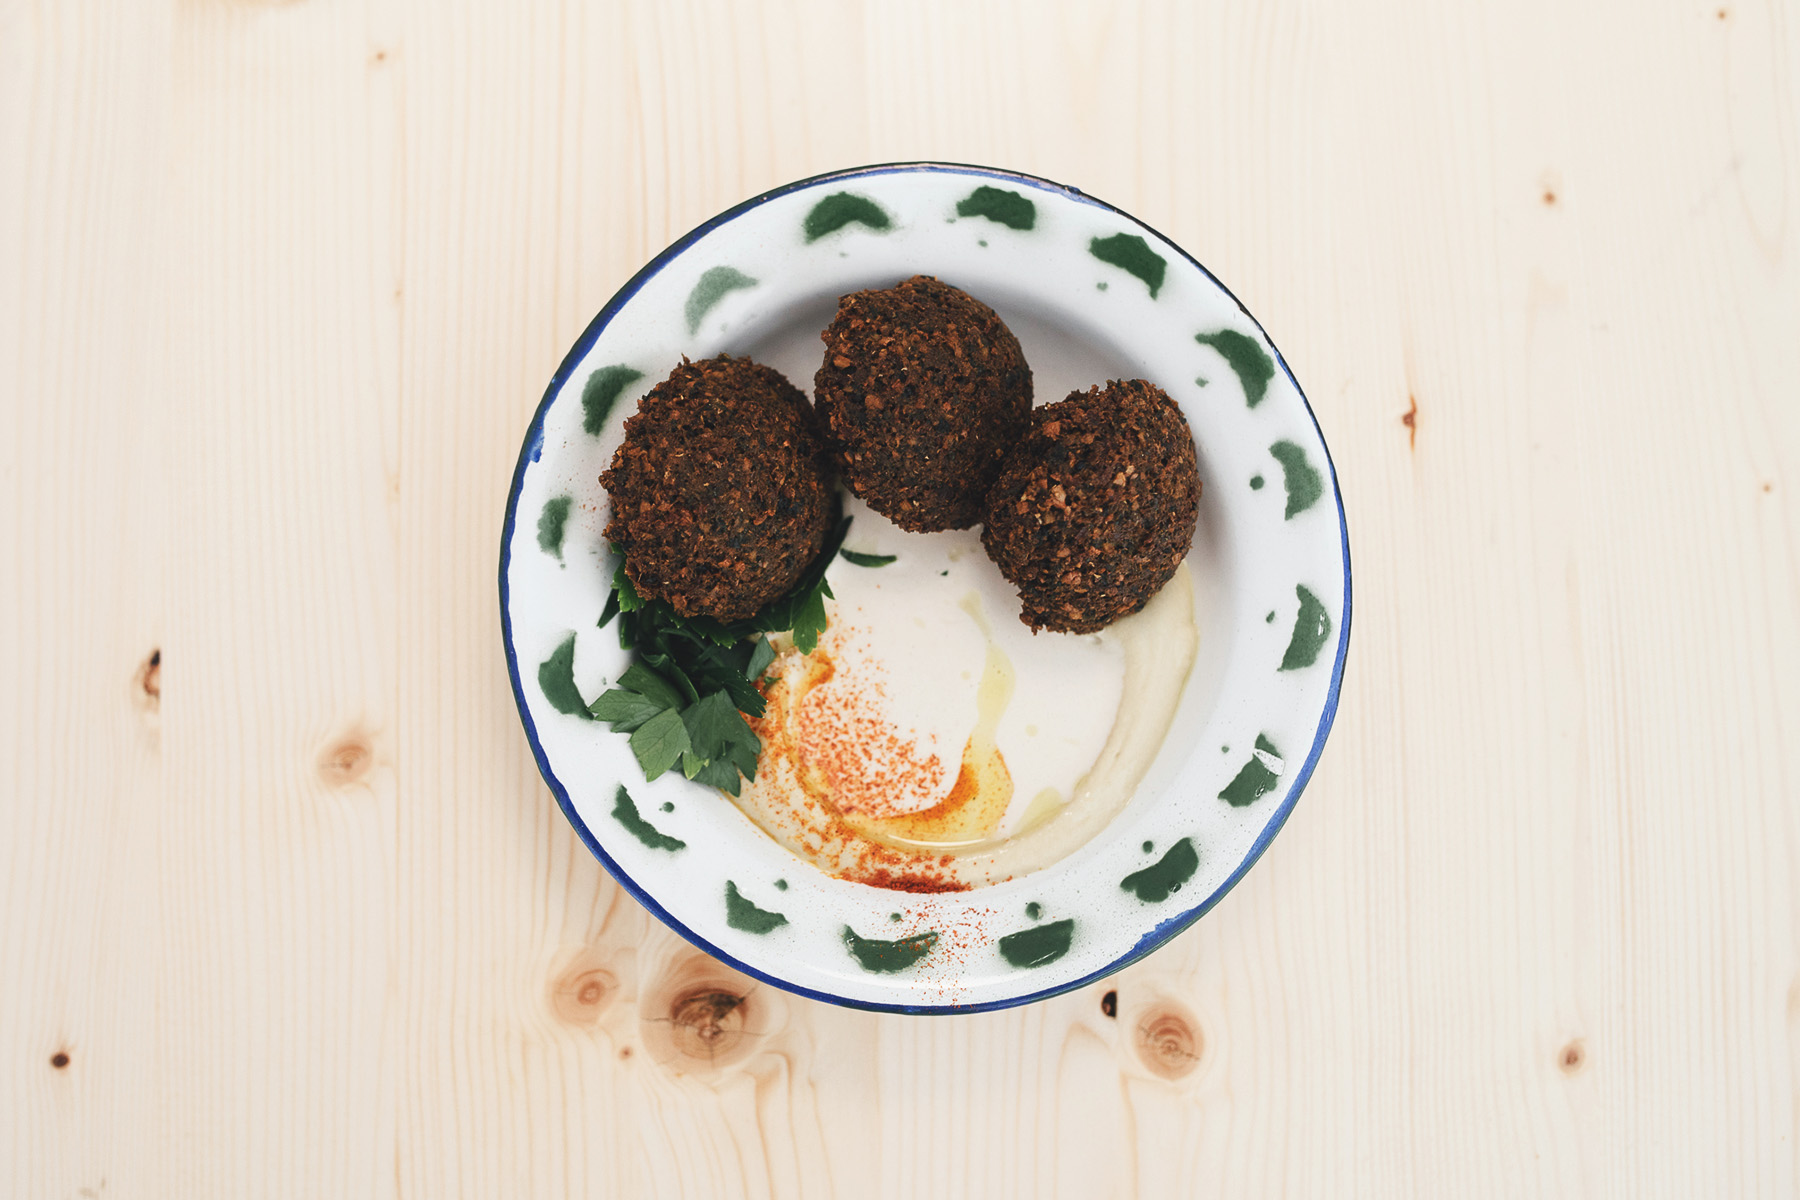 mashery 6 koeln 1 artikel – ©Mashery Hummus Kitchen